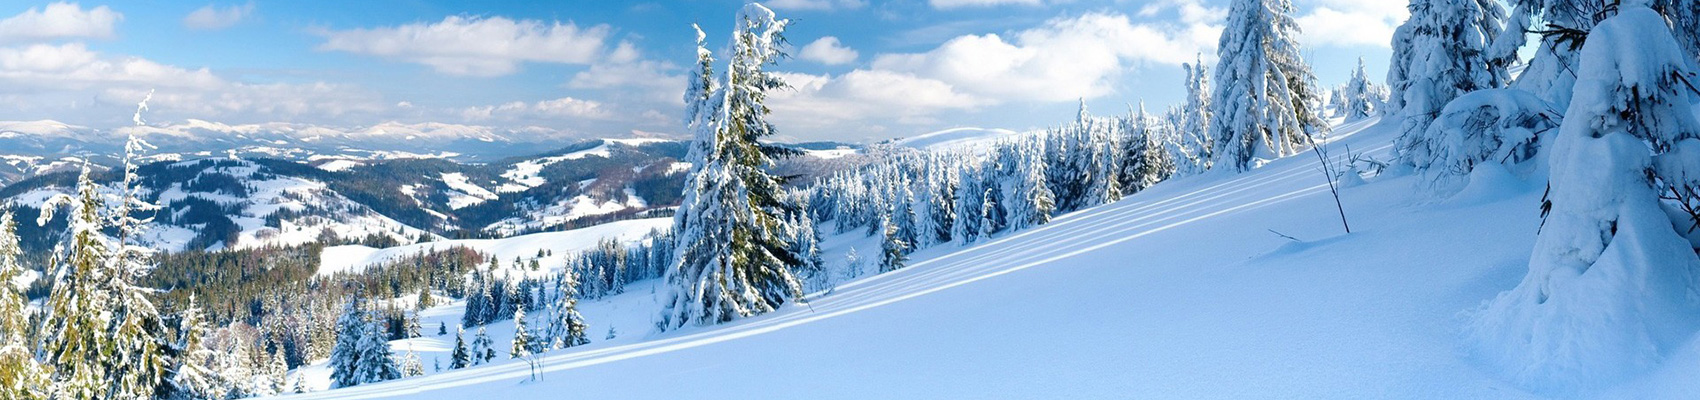 snow-bgd